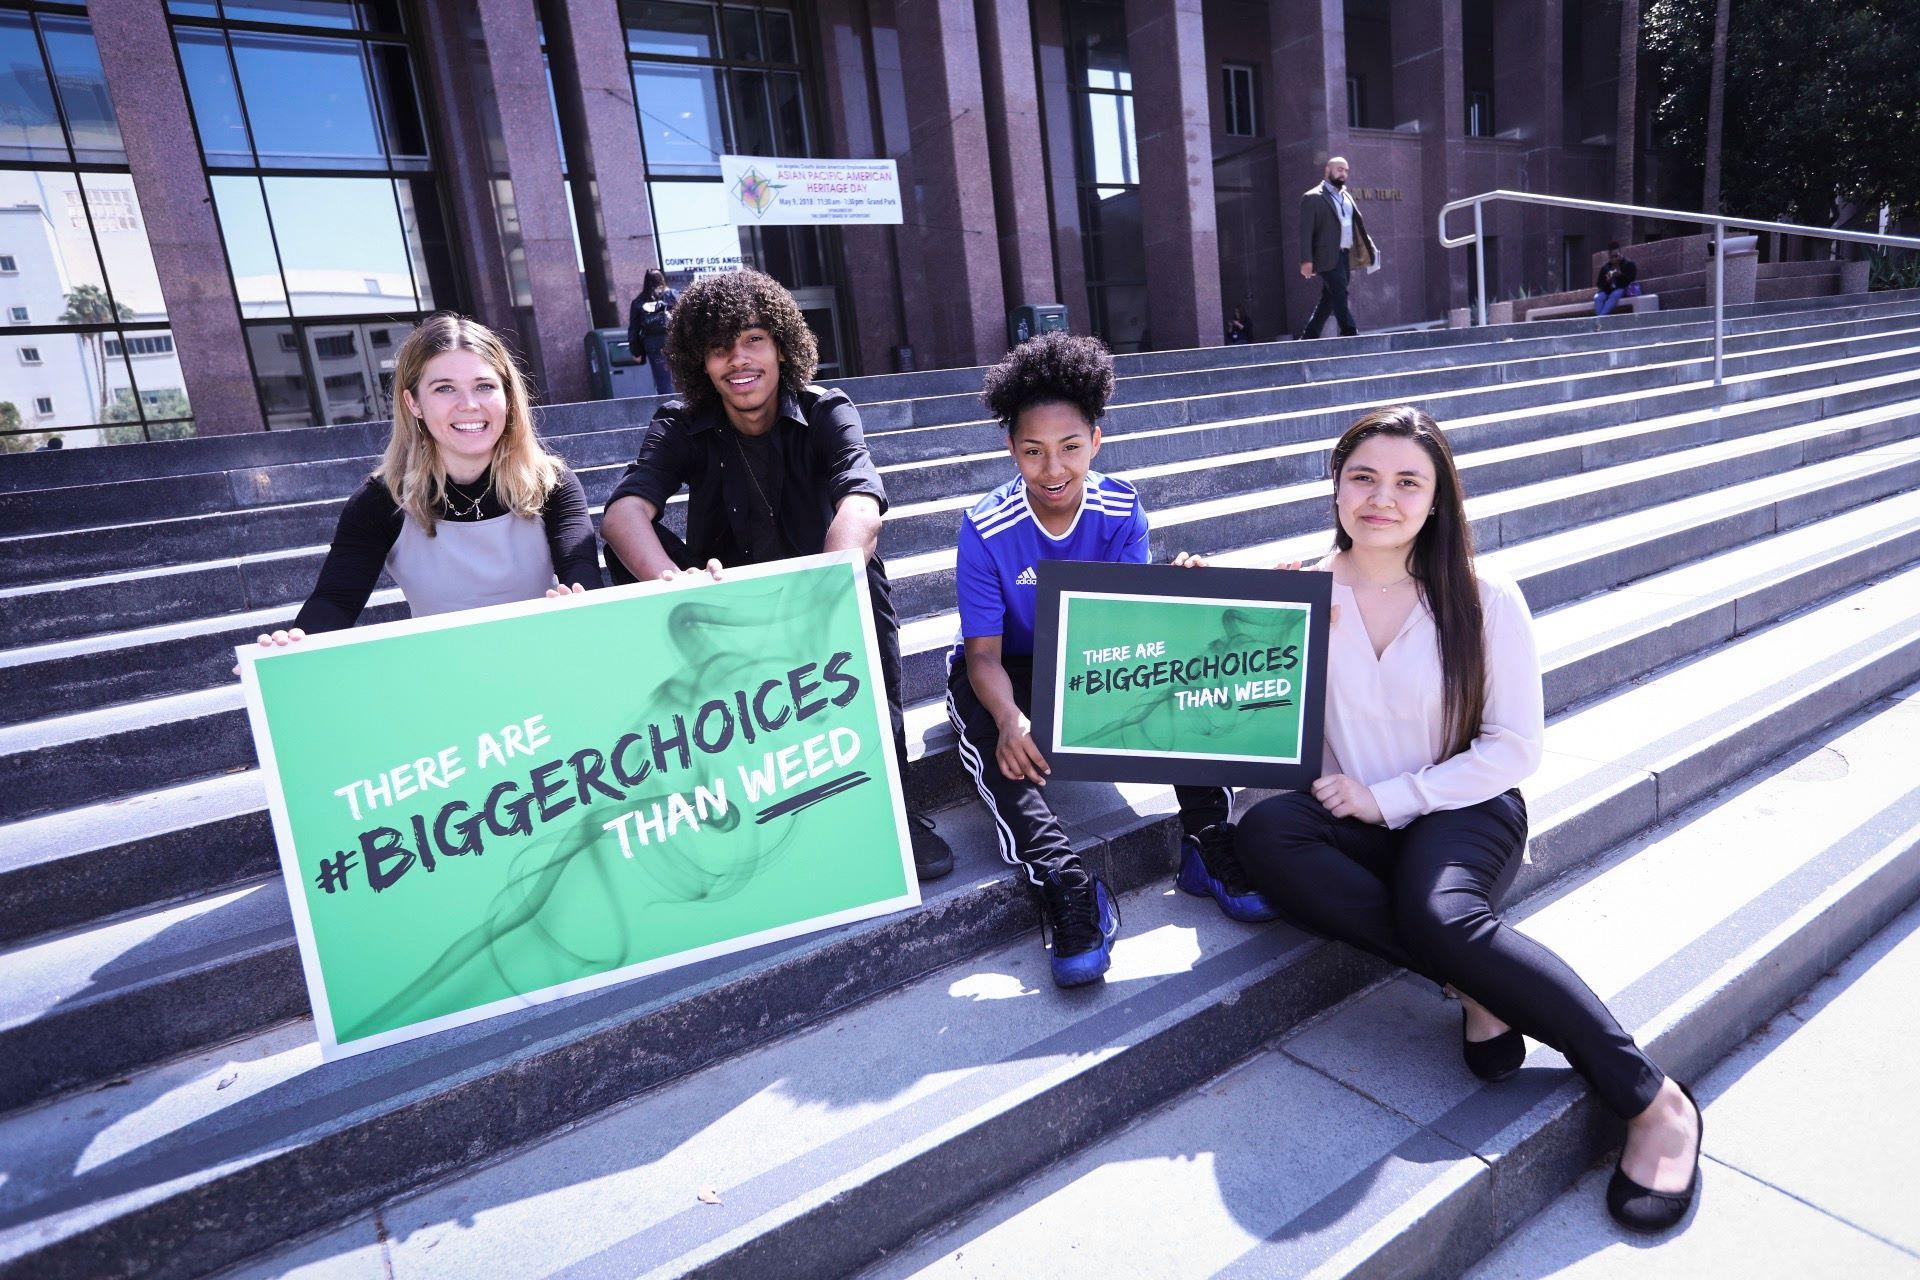 32169424 10156154246263280 1718718145172078592 o #BiggerChoices Campaign: Teens and Marijuana